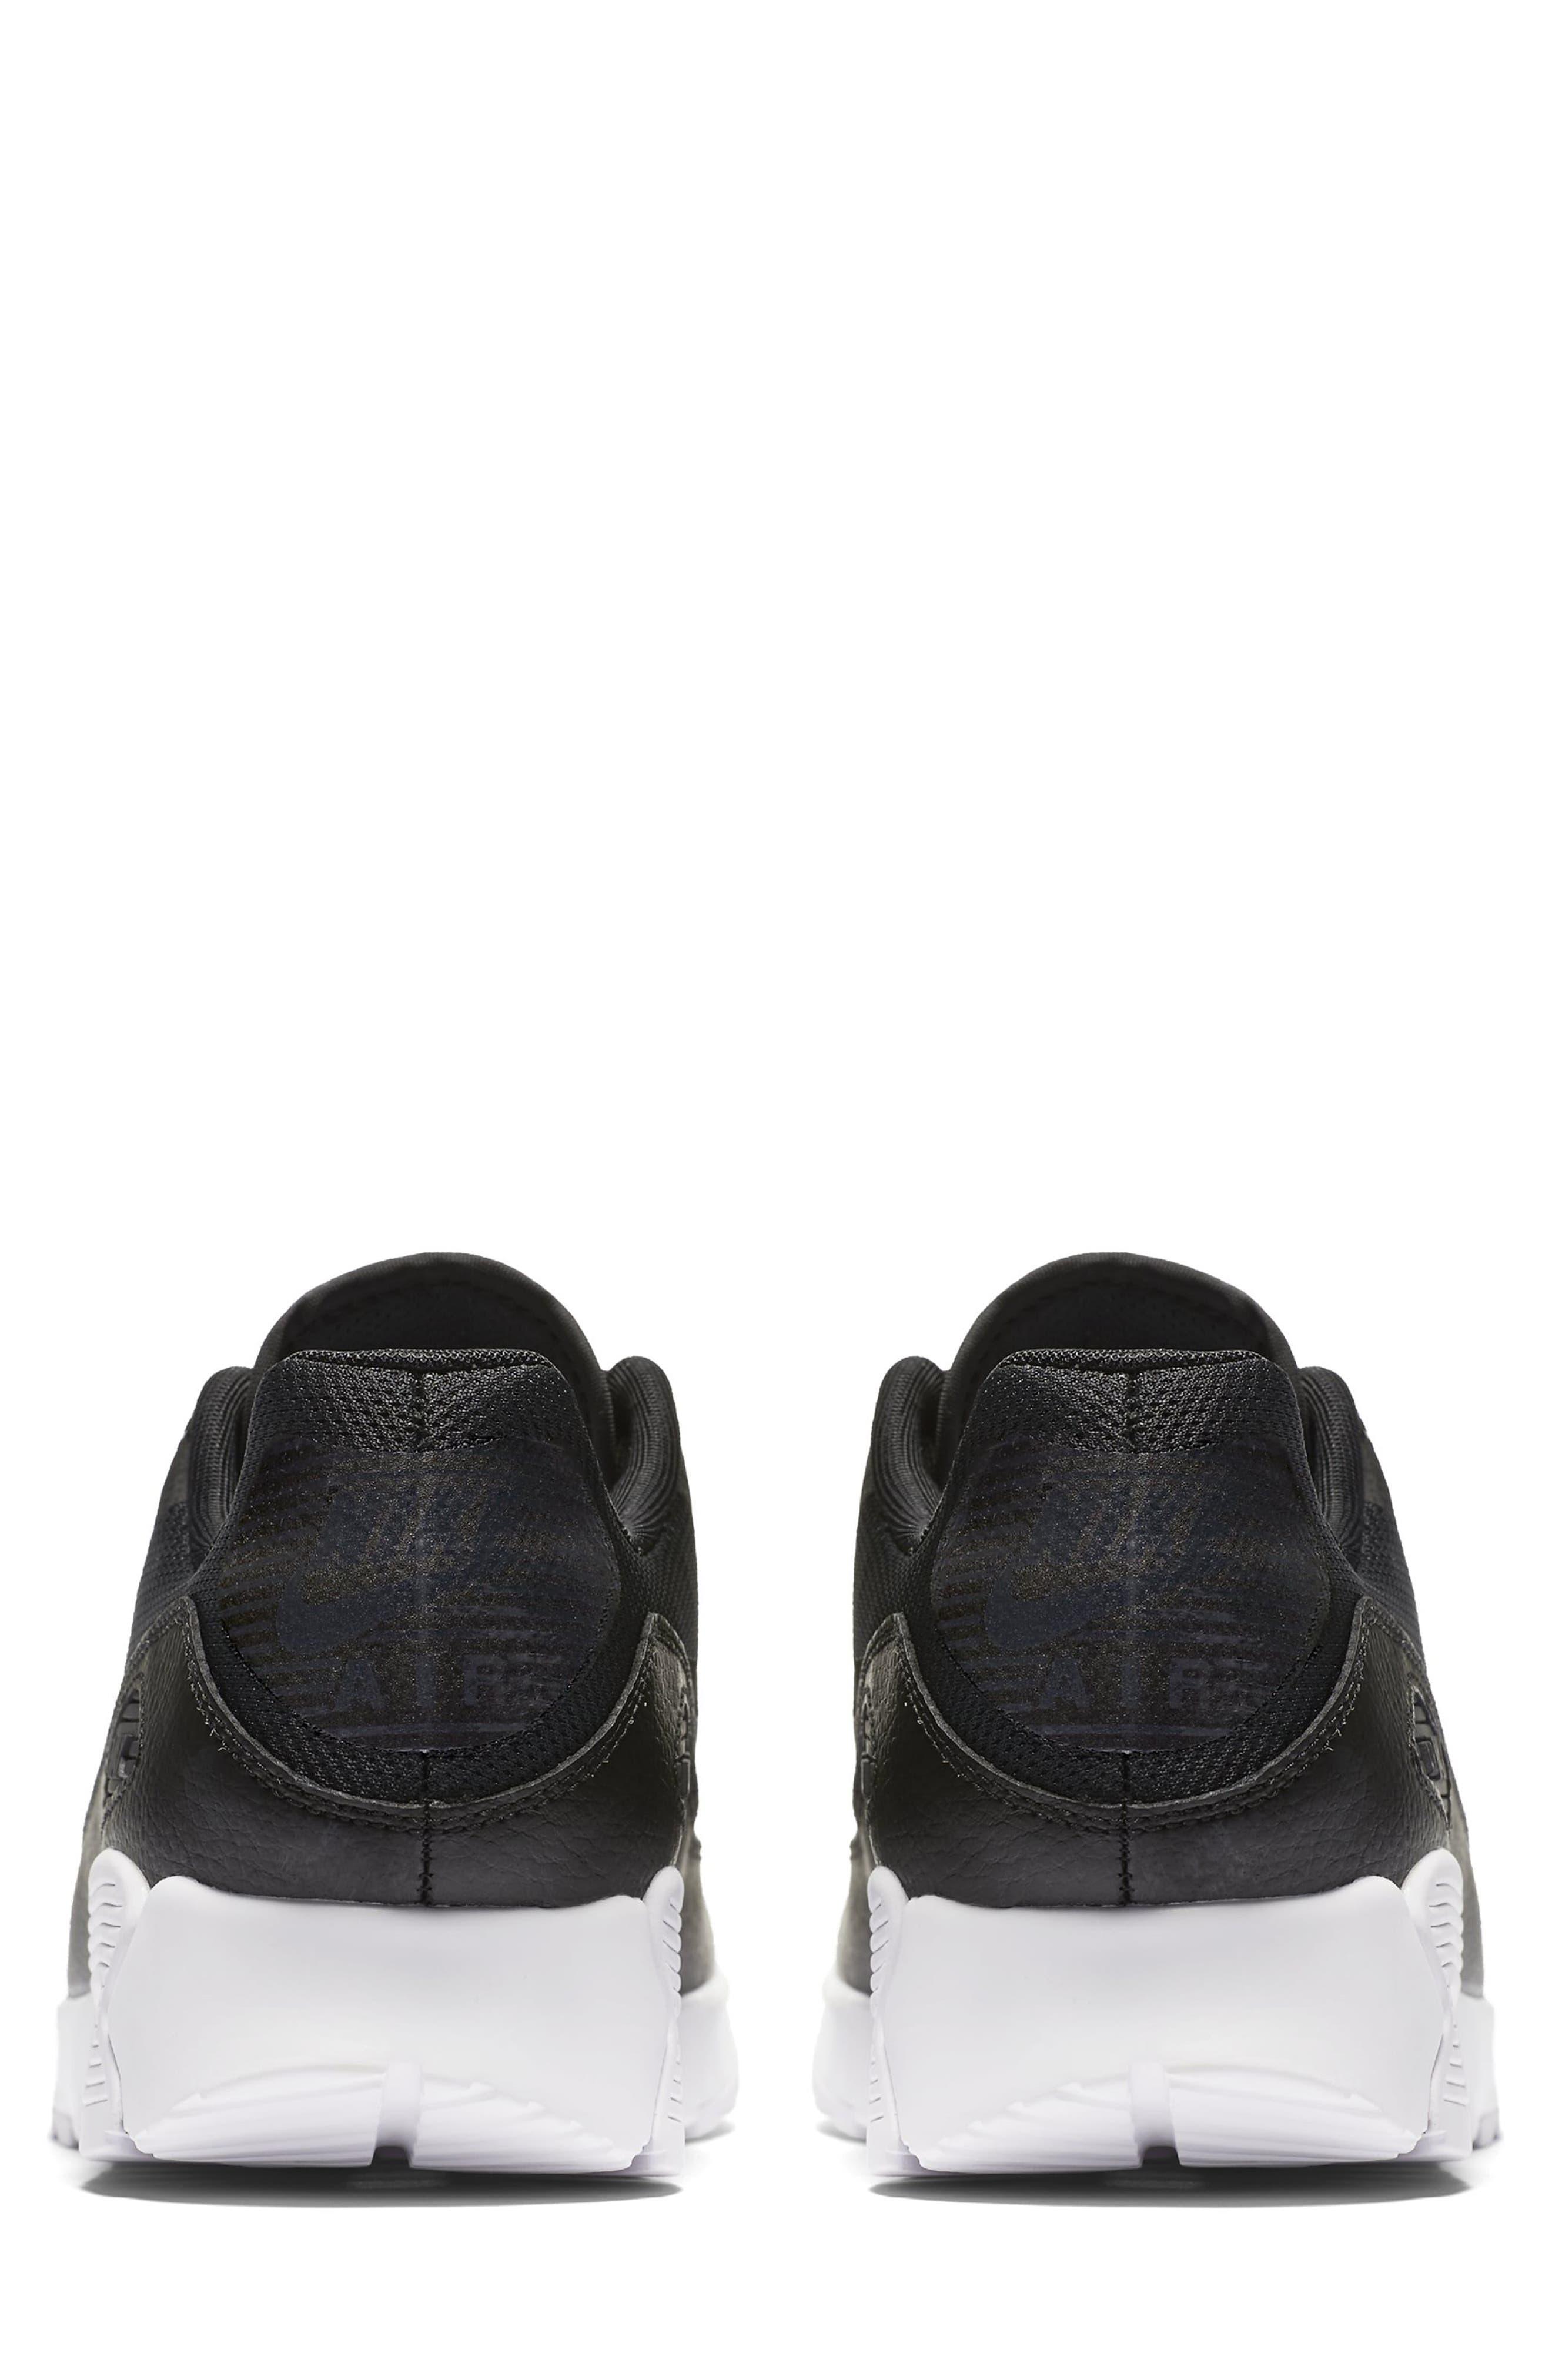 Air Max 90 Ultra 2.0 Sneaker,                             Alternate thumbnail 3, color,                             Black/ White/ Black